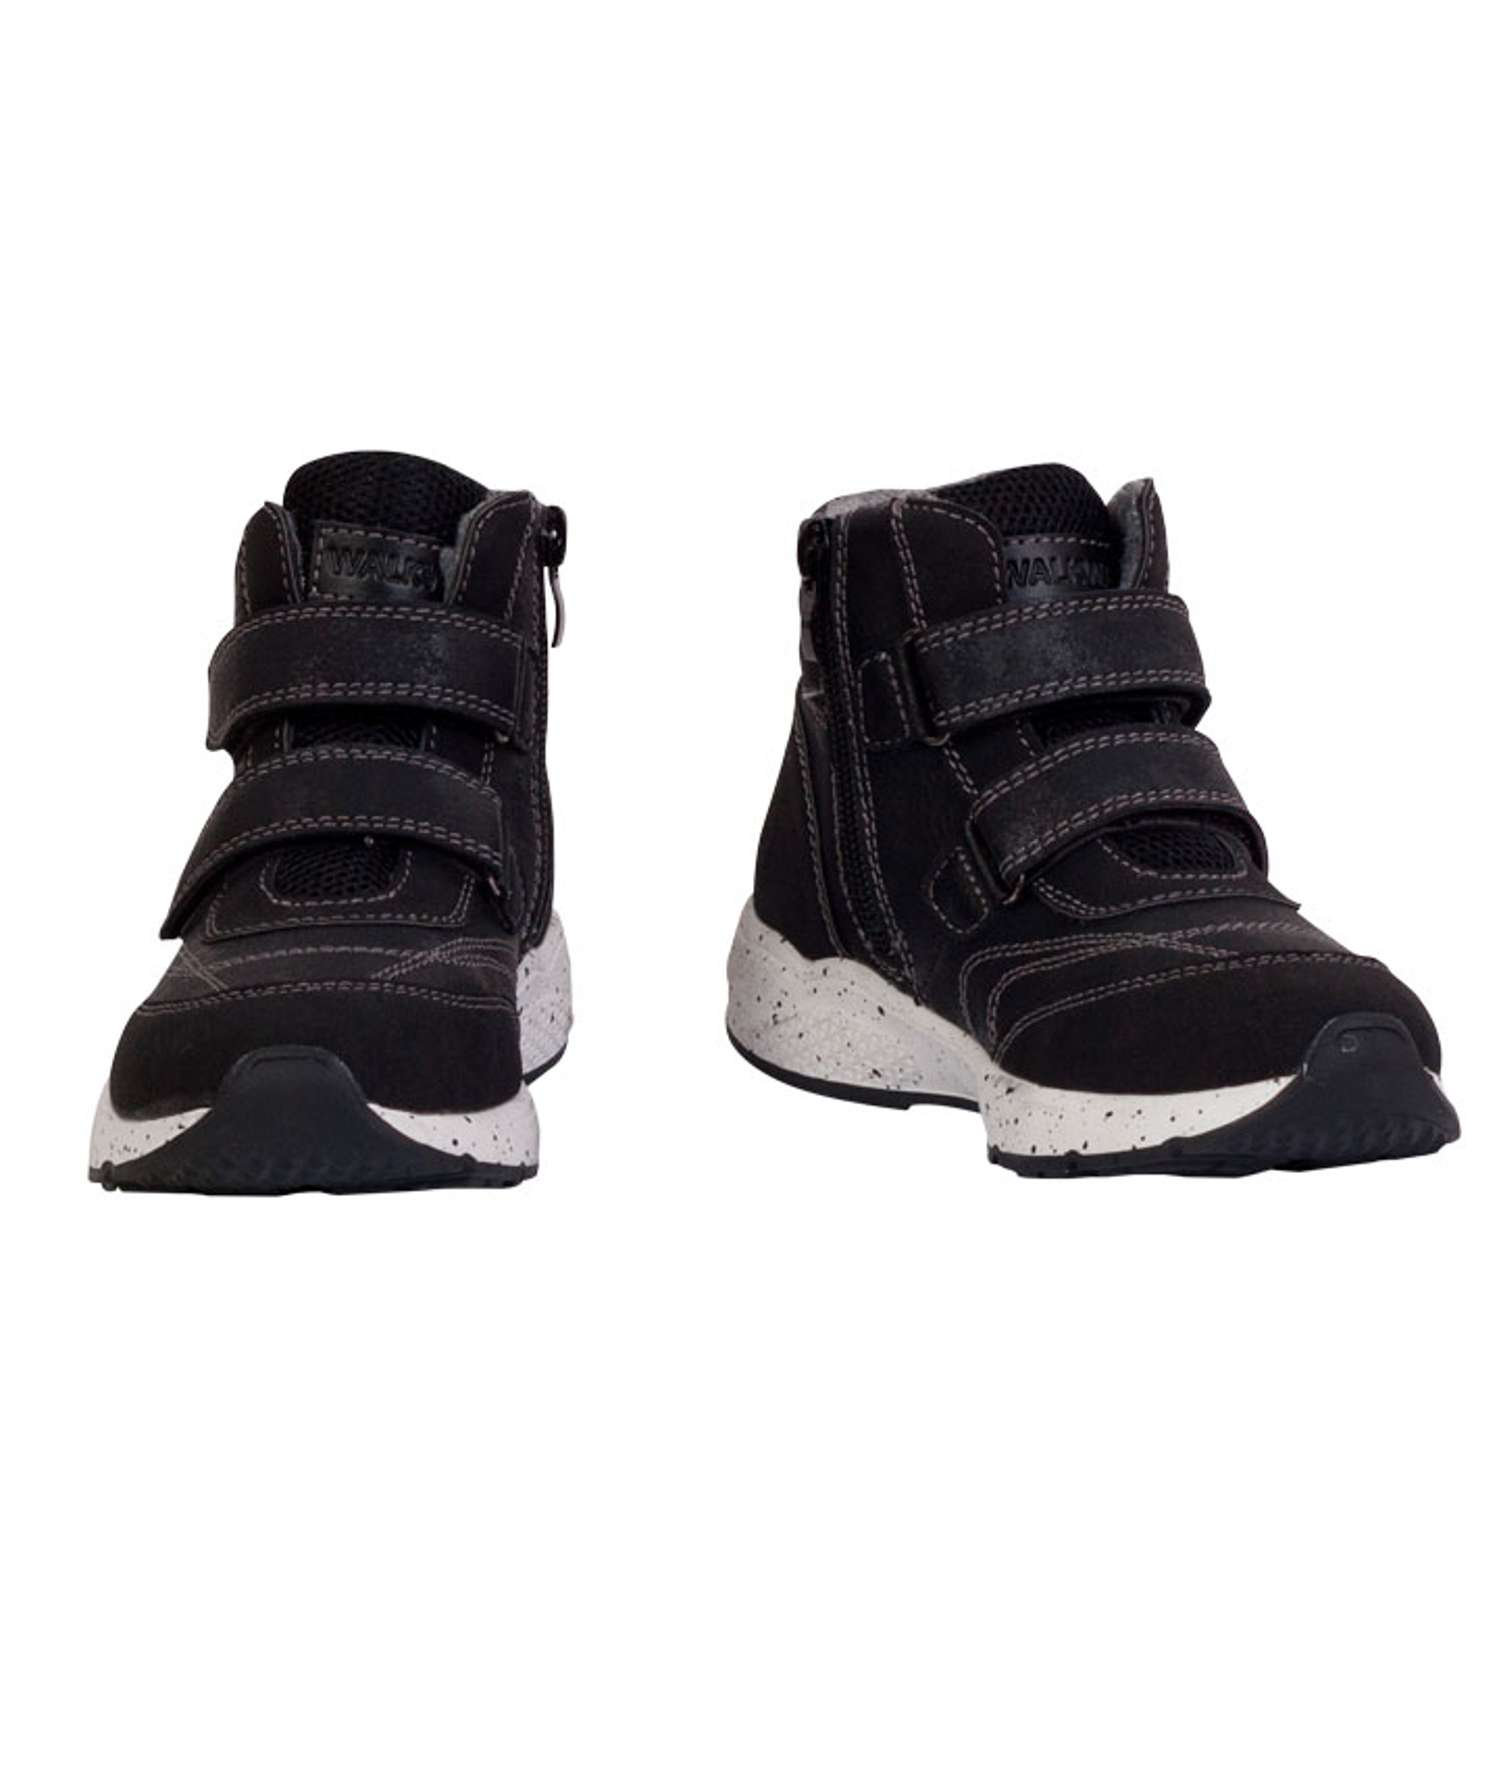 Walkway - Akako børne vinter sneakers - Sort - Størrelse 34